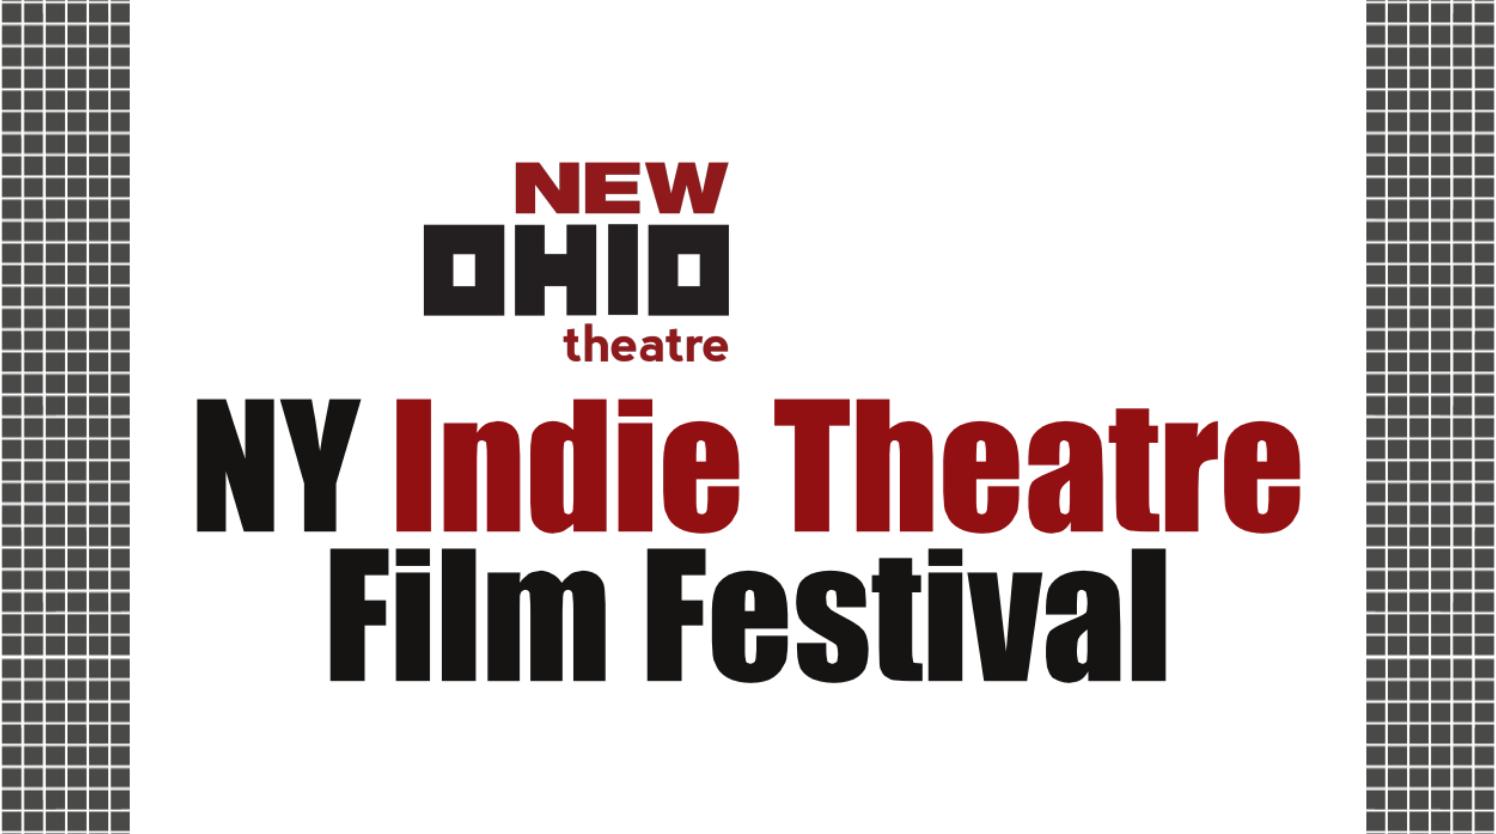 NY Indie Theatre Film Festival logo